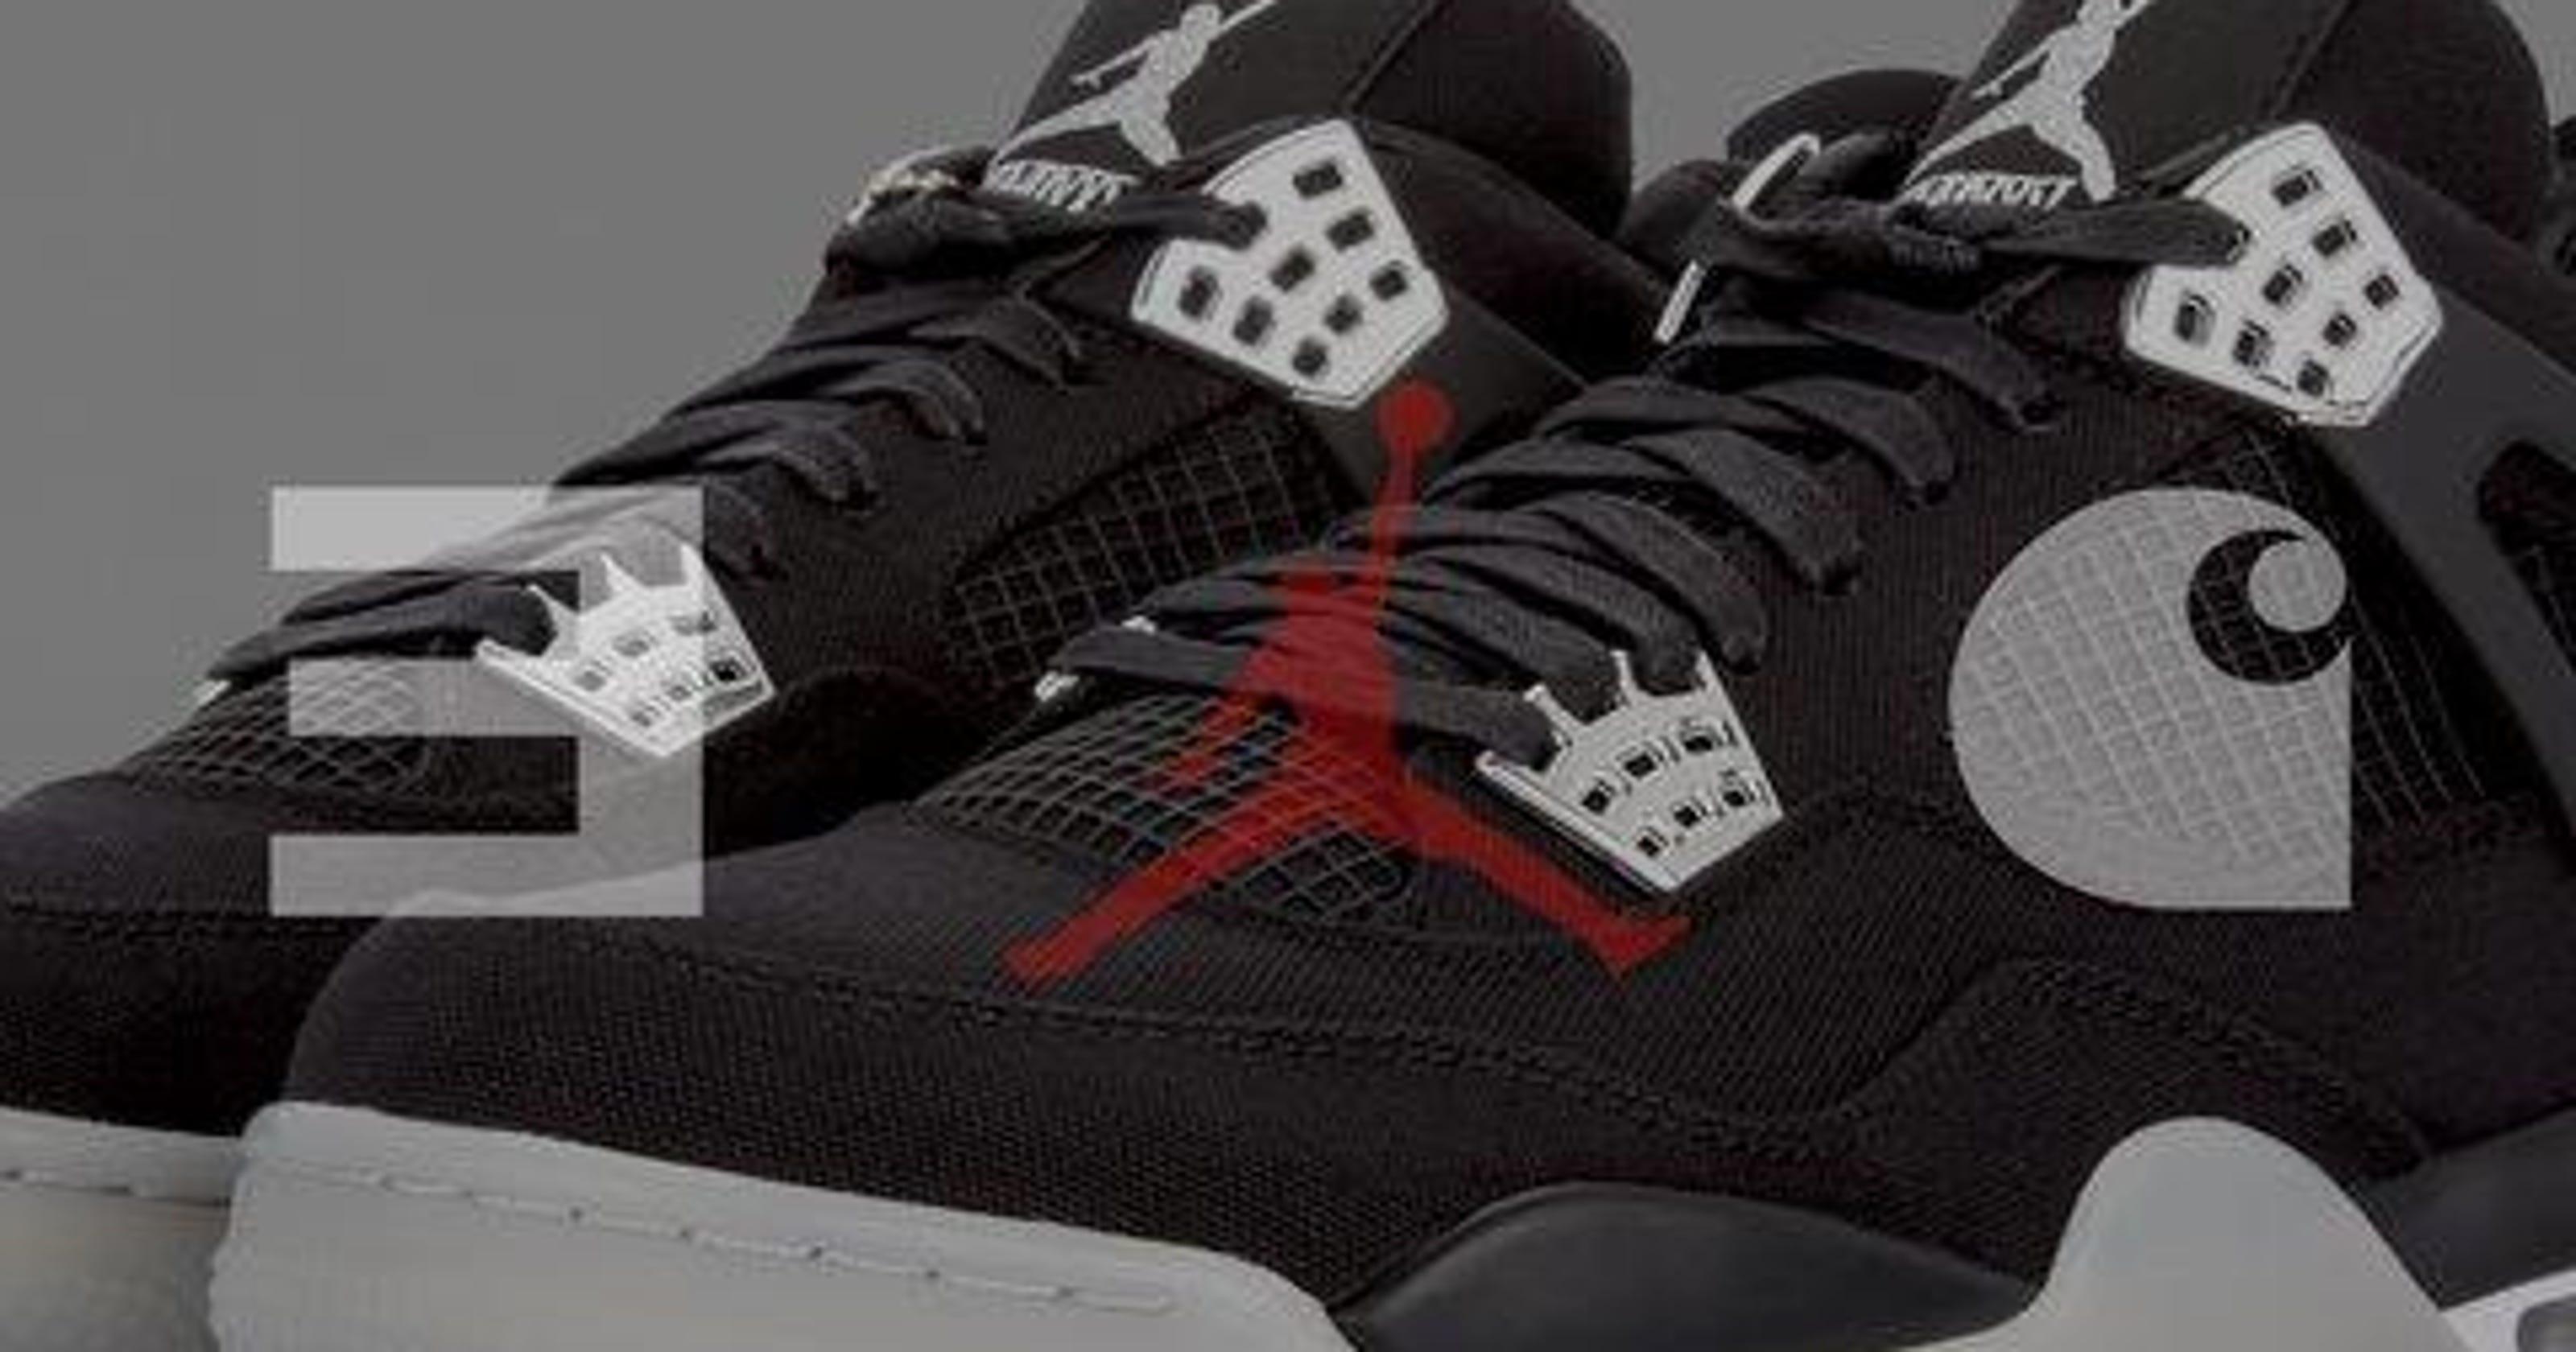 on sale 88ba3 8389c Eminem Air Jordans net $227,000 in eBay auction